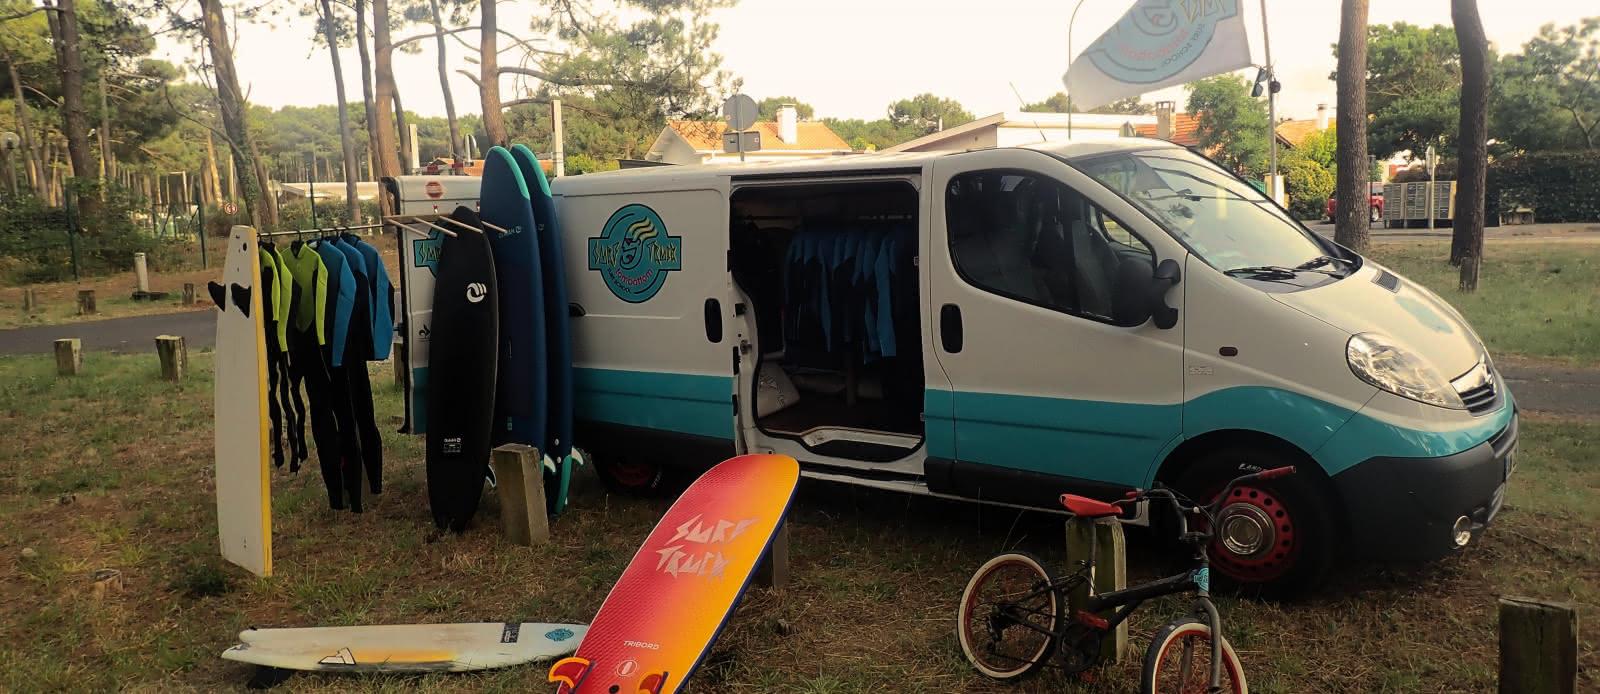 Tombottom Surf Truck 8